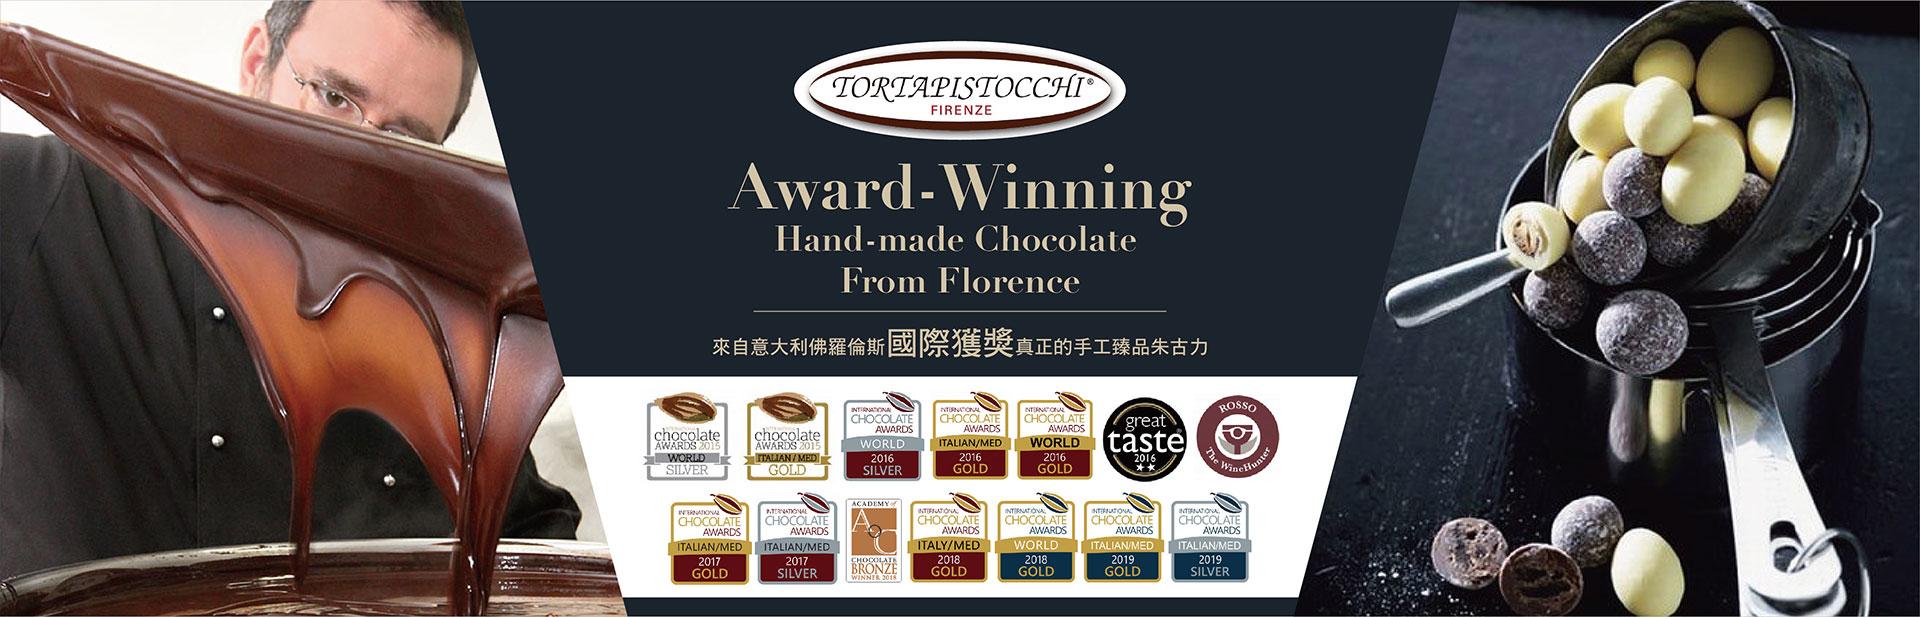 Tortapistocchi,Awards-Winning Chocolate Dragées,handmade chocolate,手工朱古力,意大利朱古力,hamper,禮籃,gifting,送禮